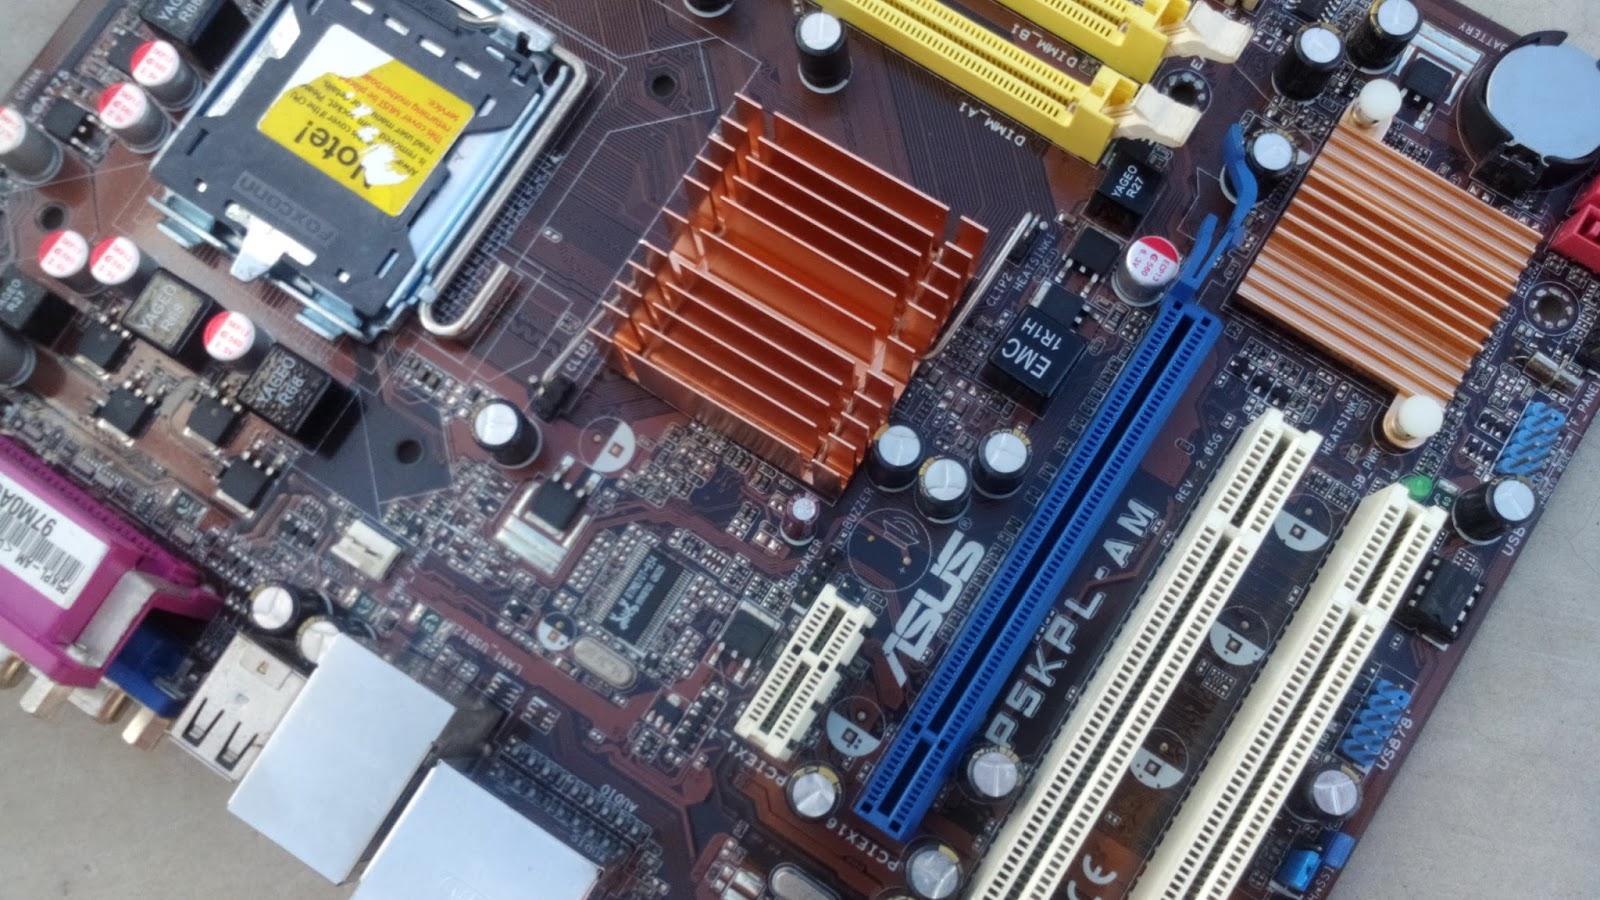 Asus P5kpl Amps Motherboard Circuit Diagram  Somurich